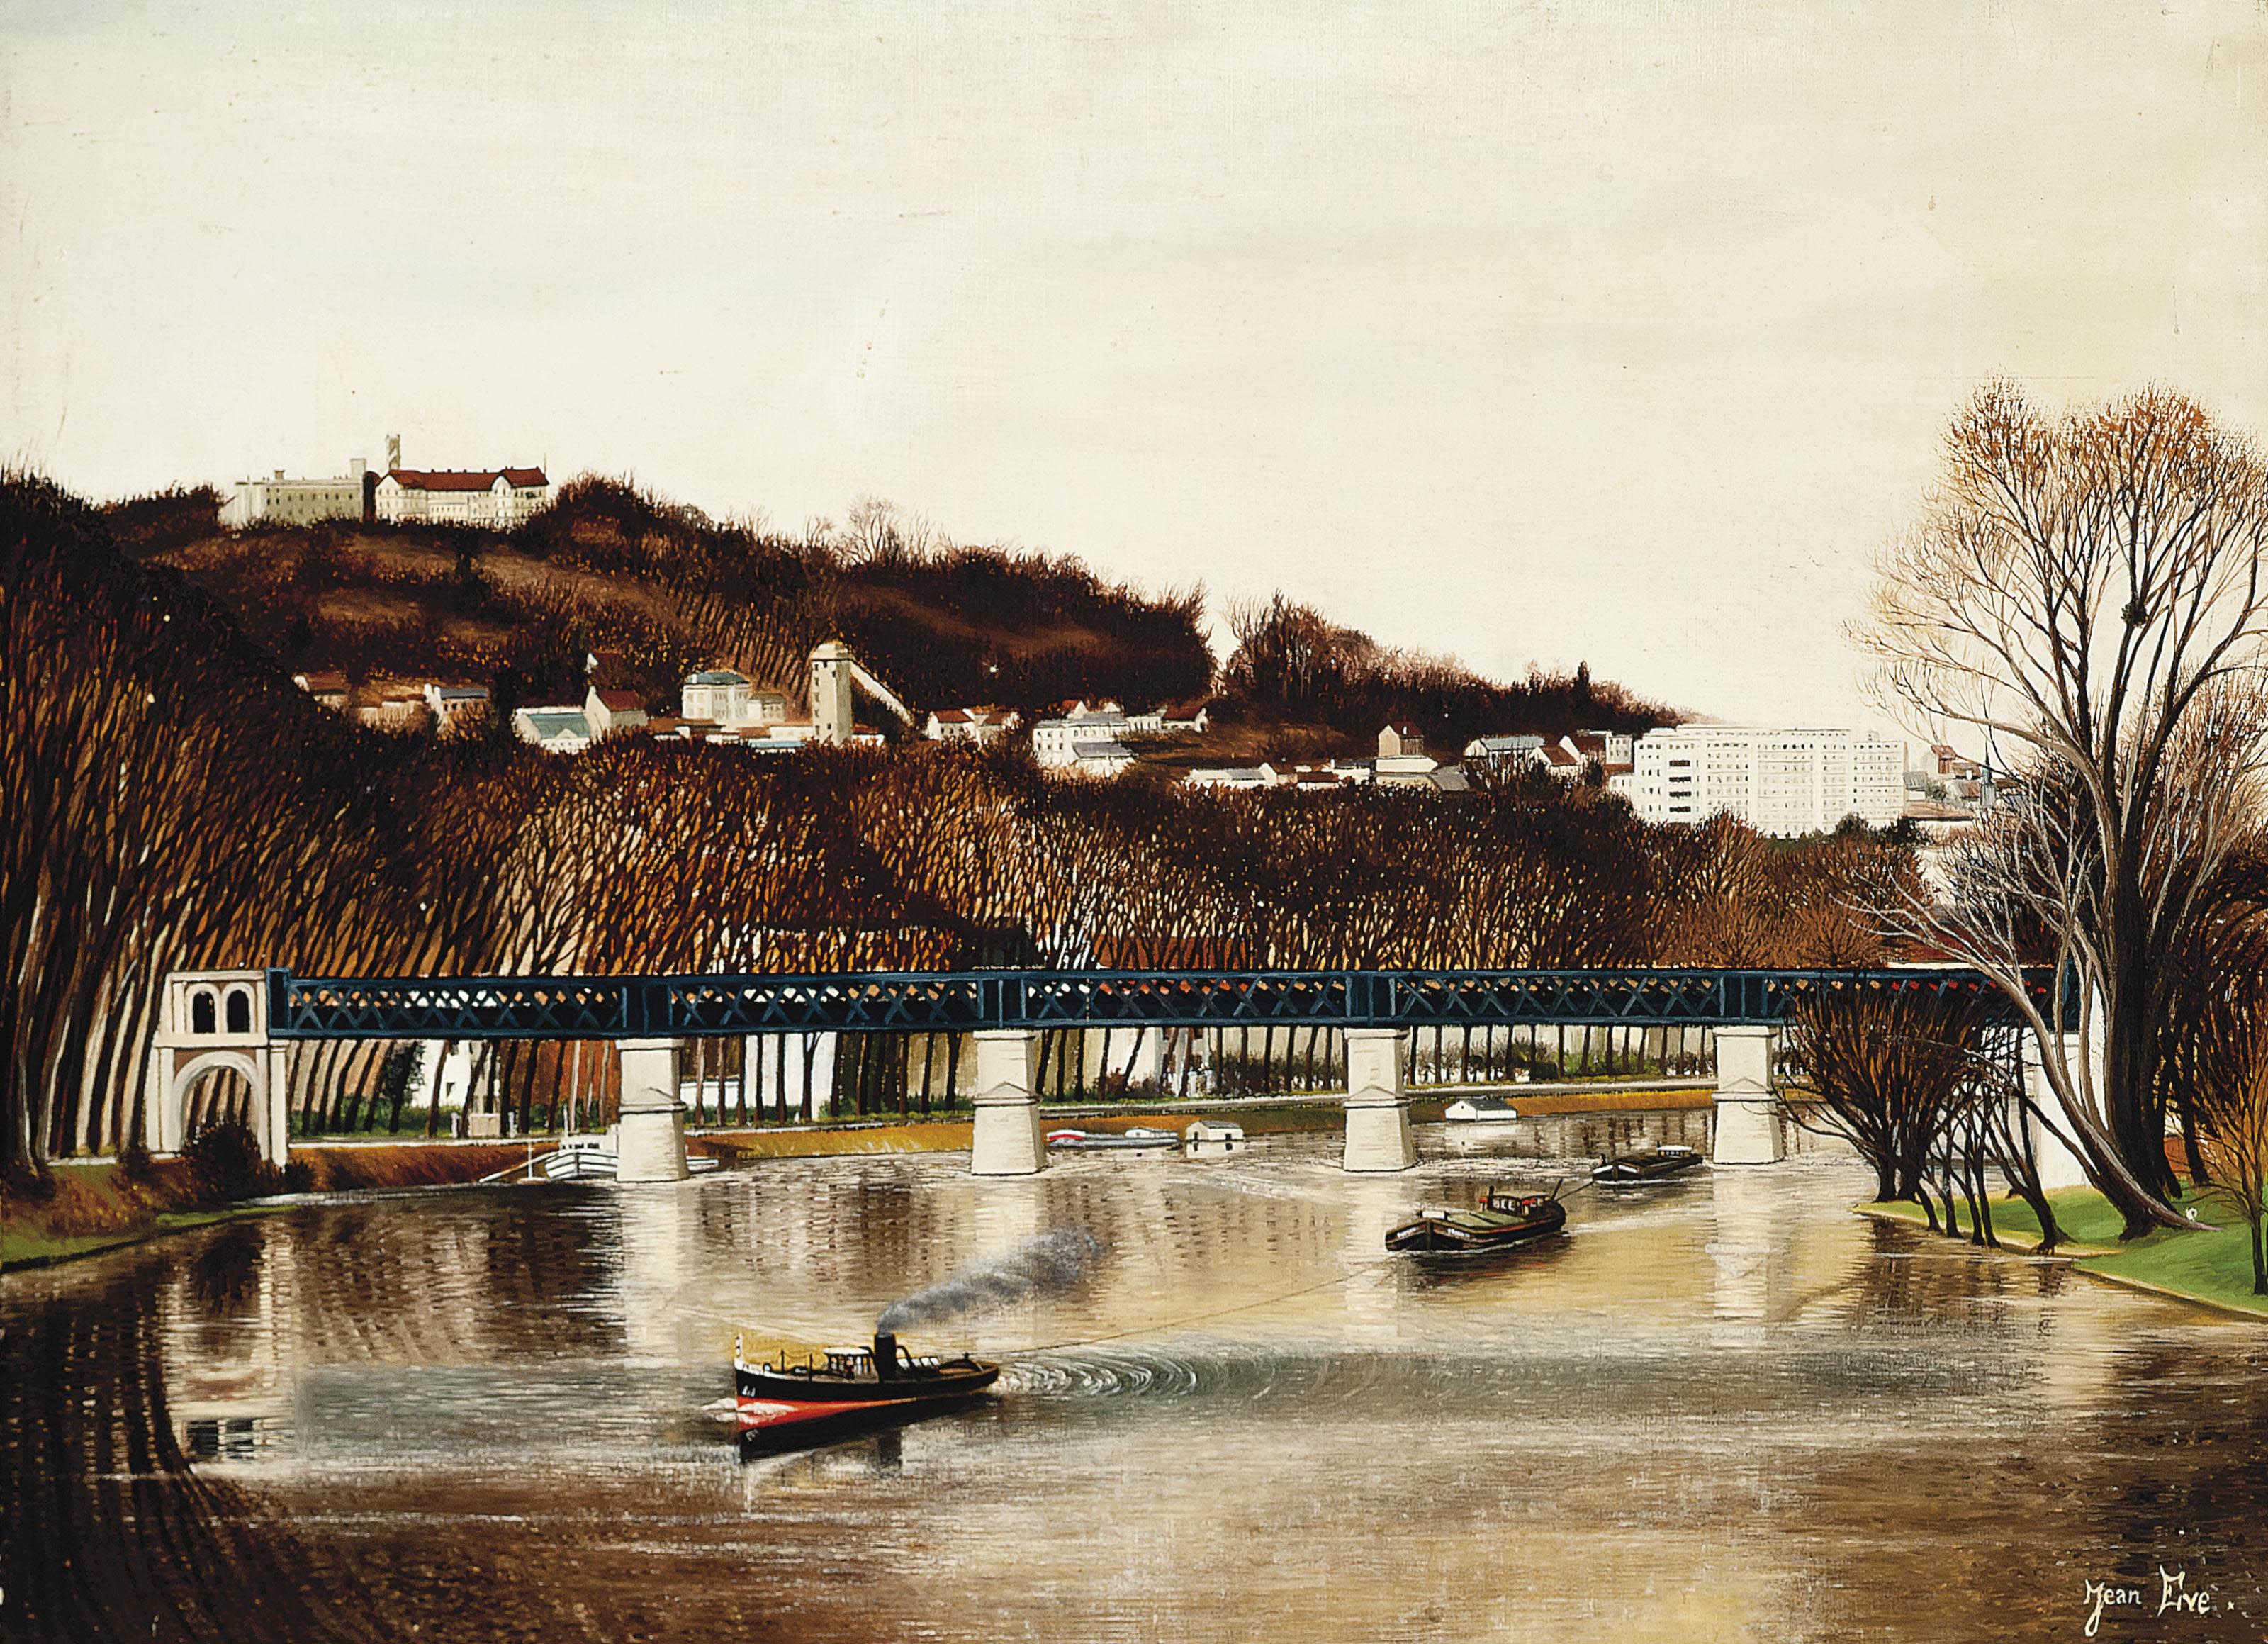 Tug boats on the Seine